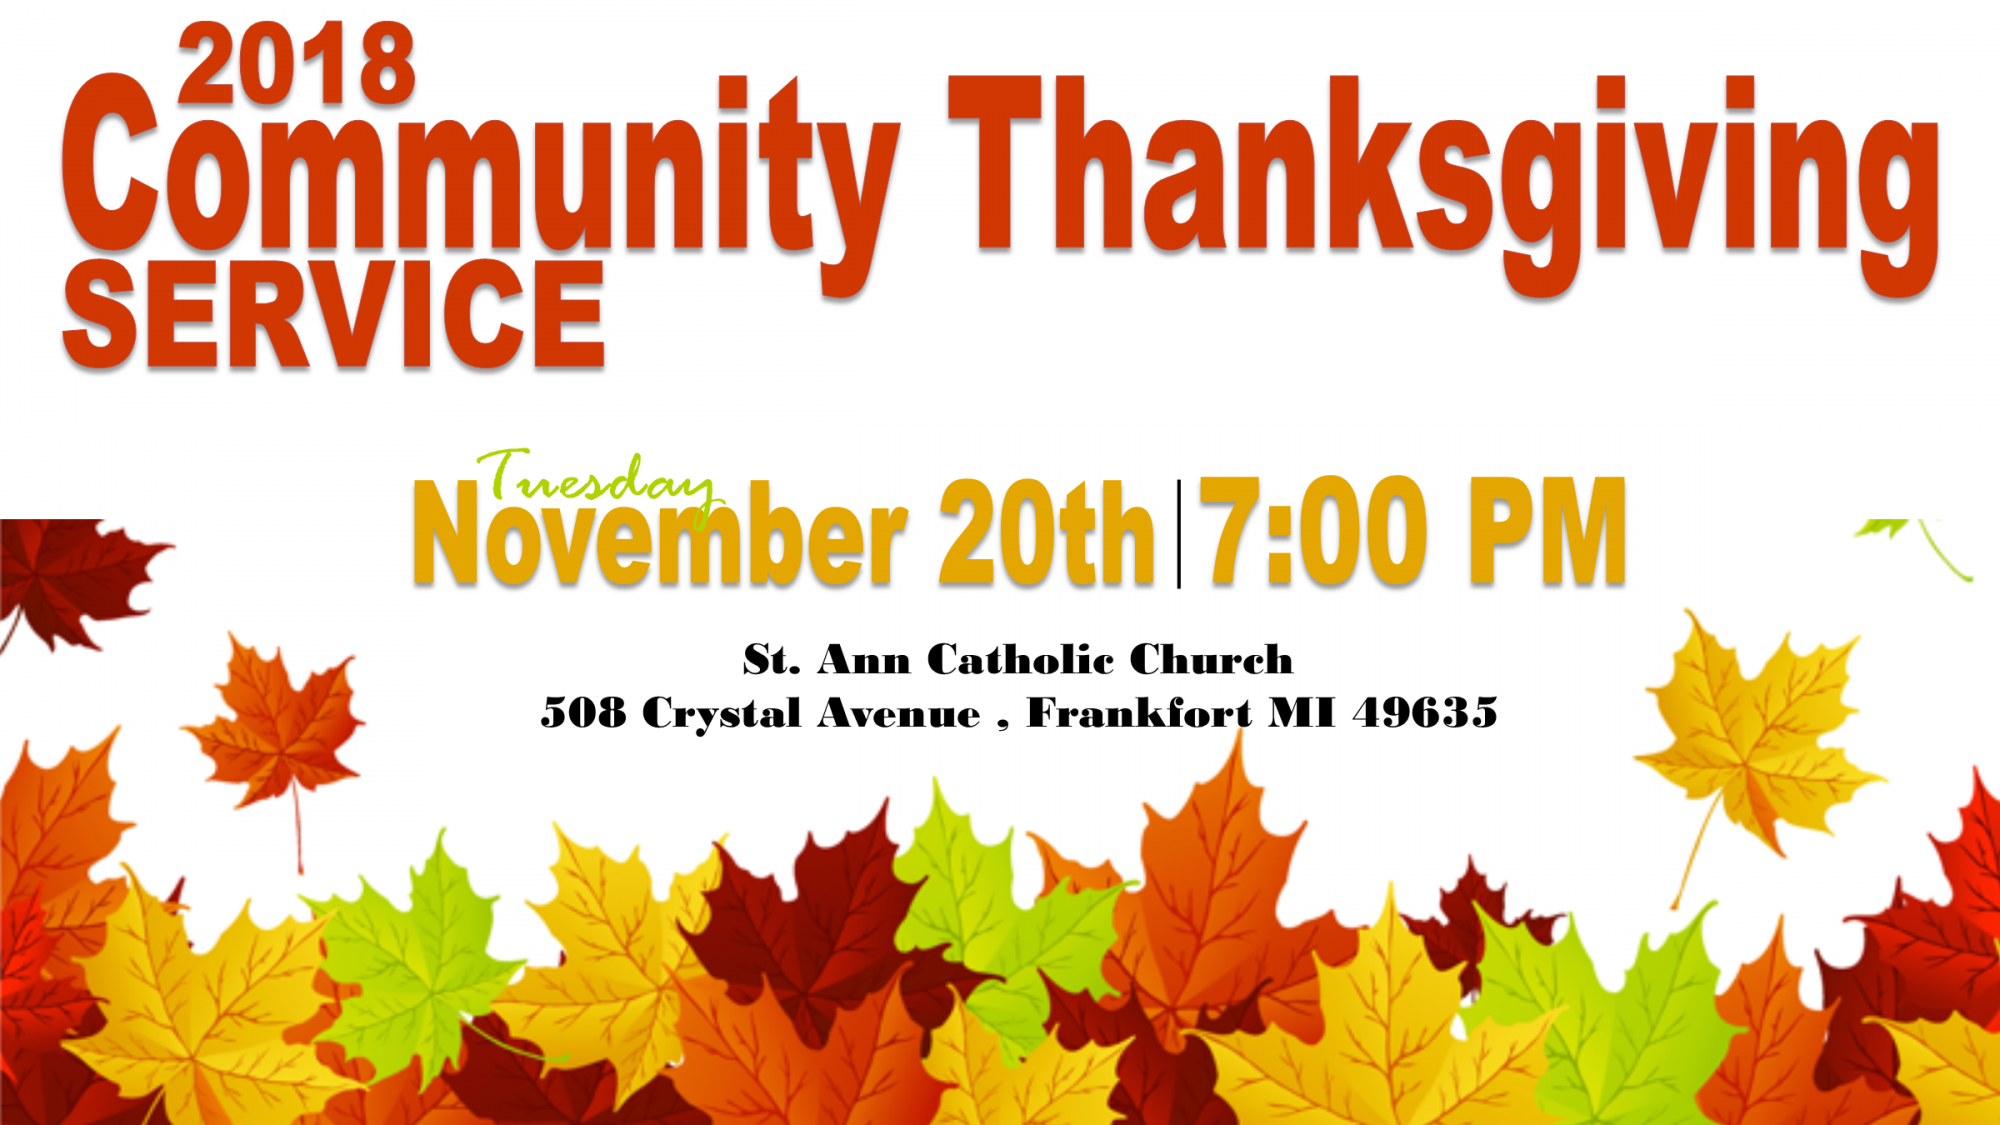 2018 Community Thanksgiving Banner